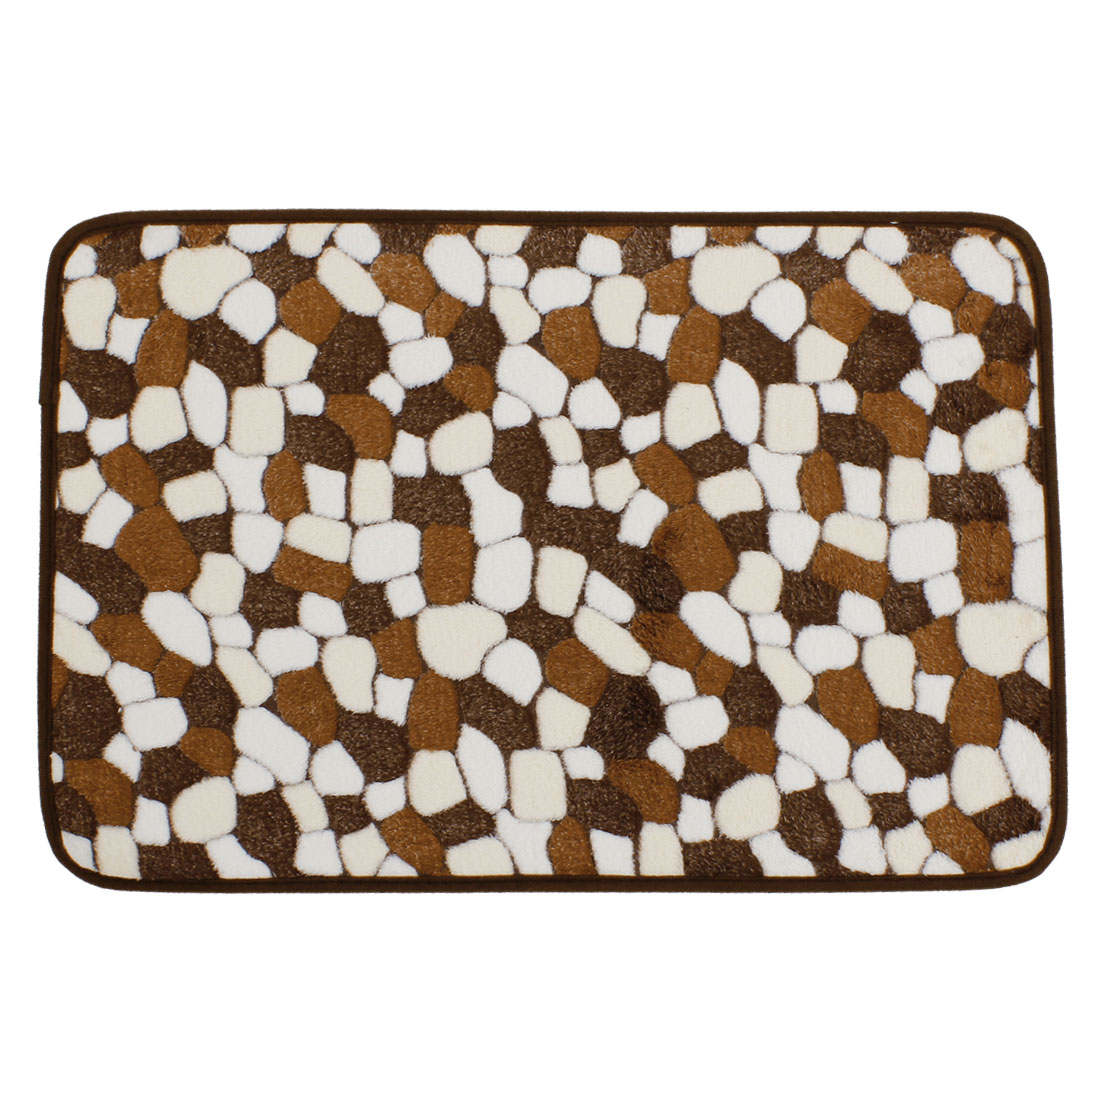 Bedroom White Brown Cobblestone Patetrn Nonslip Mat Area Rug Carpet 60cm x 40cm